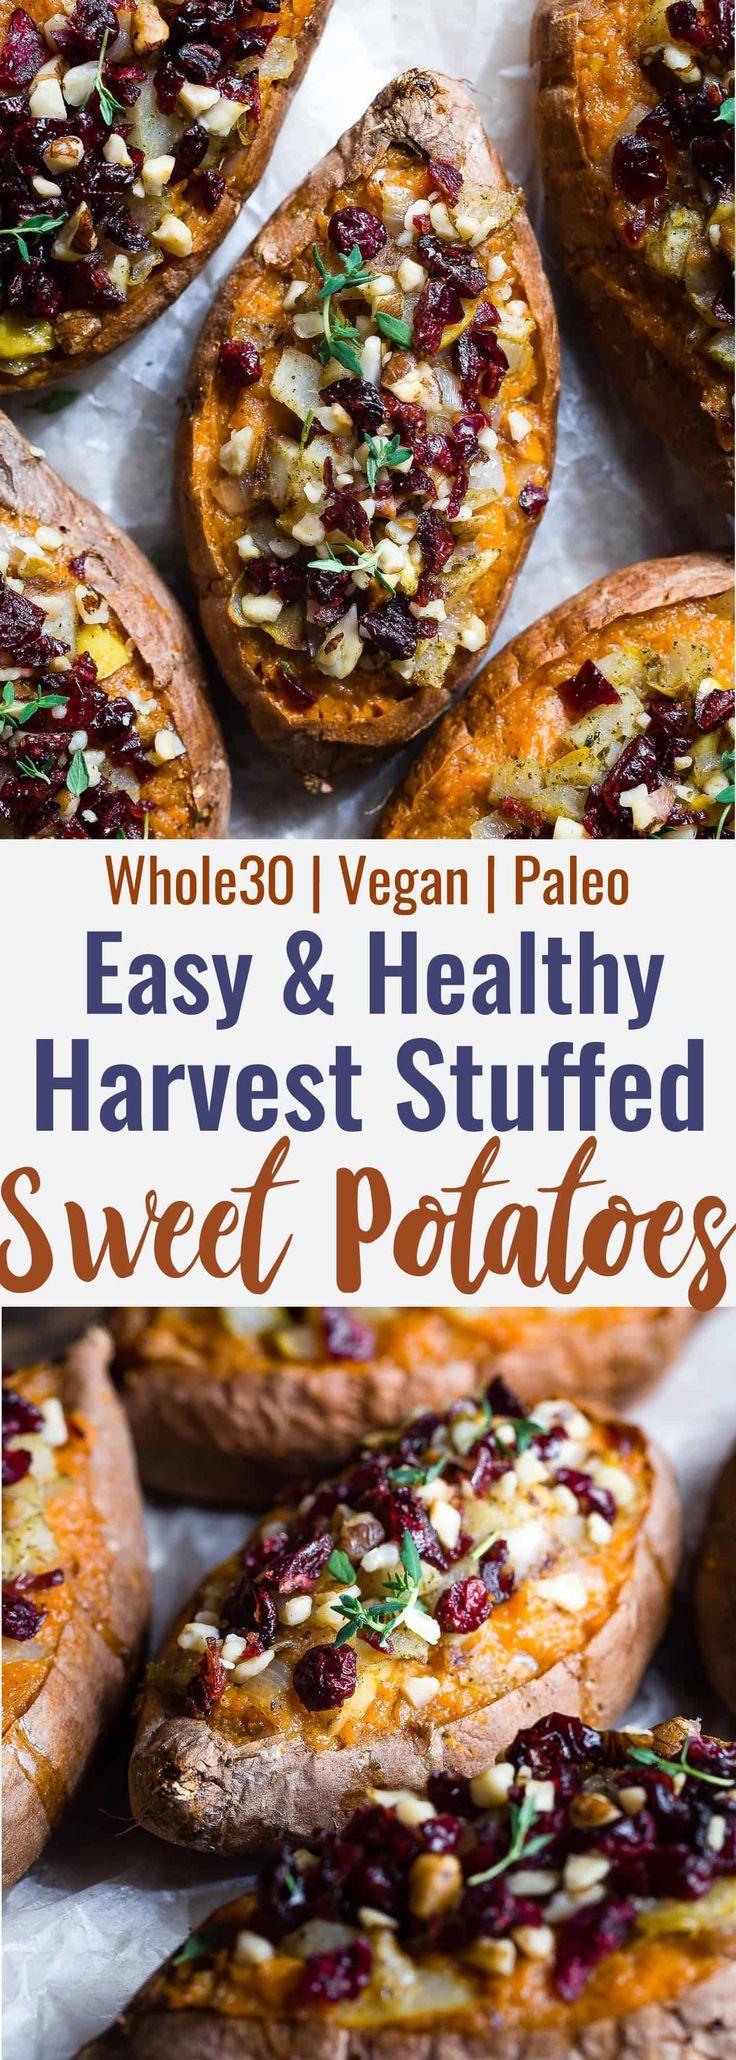 Harvest Paleo Vegan Stuffed Sweet Potatoes –These healthy stuffed sweet potato…